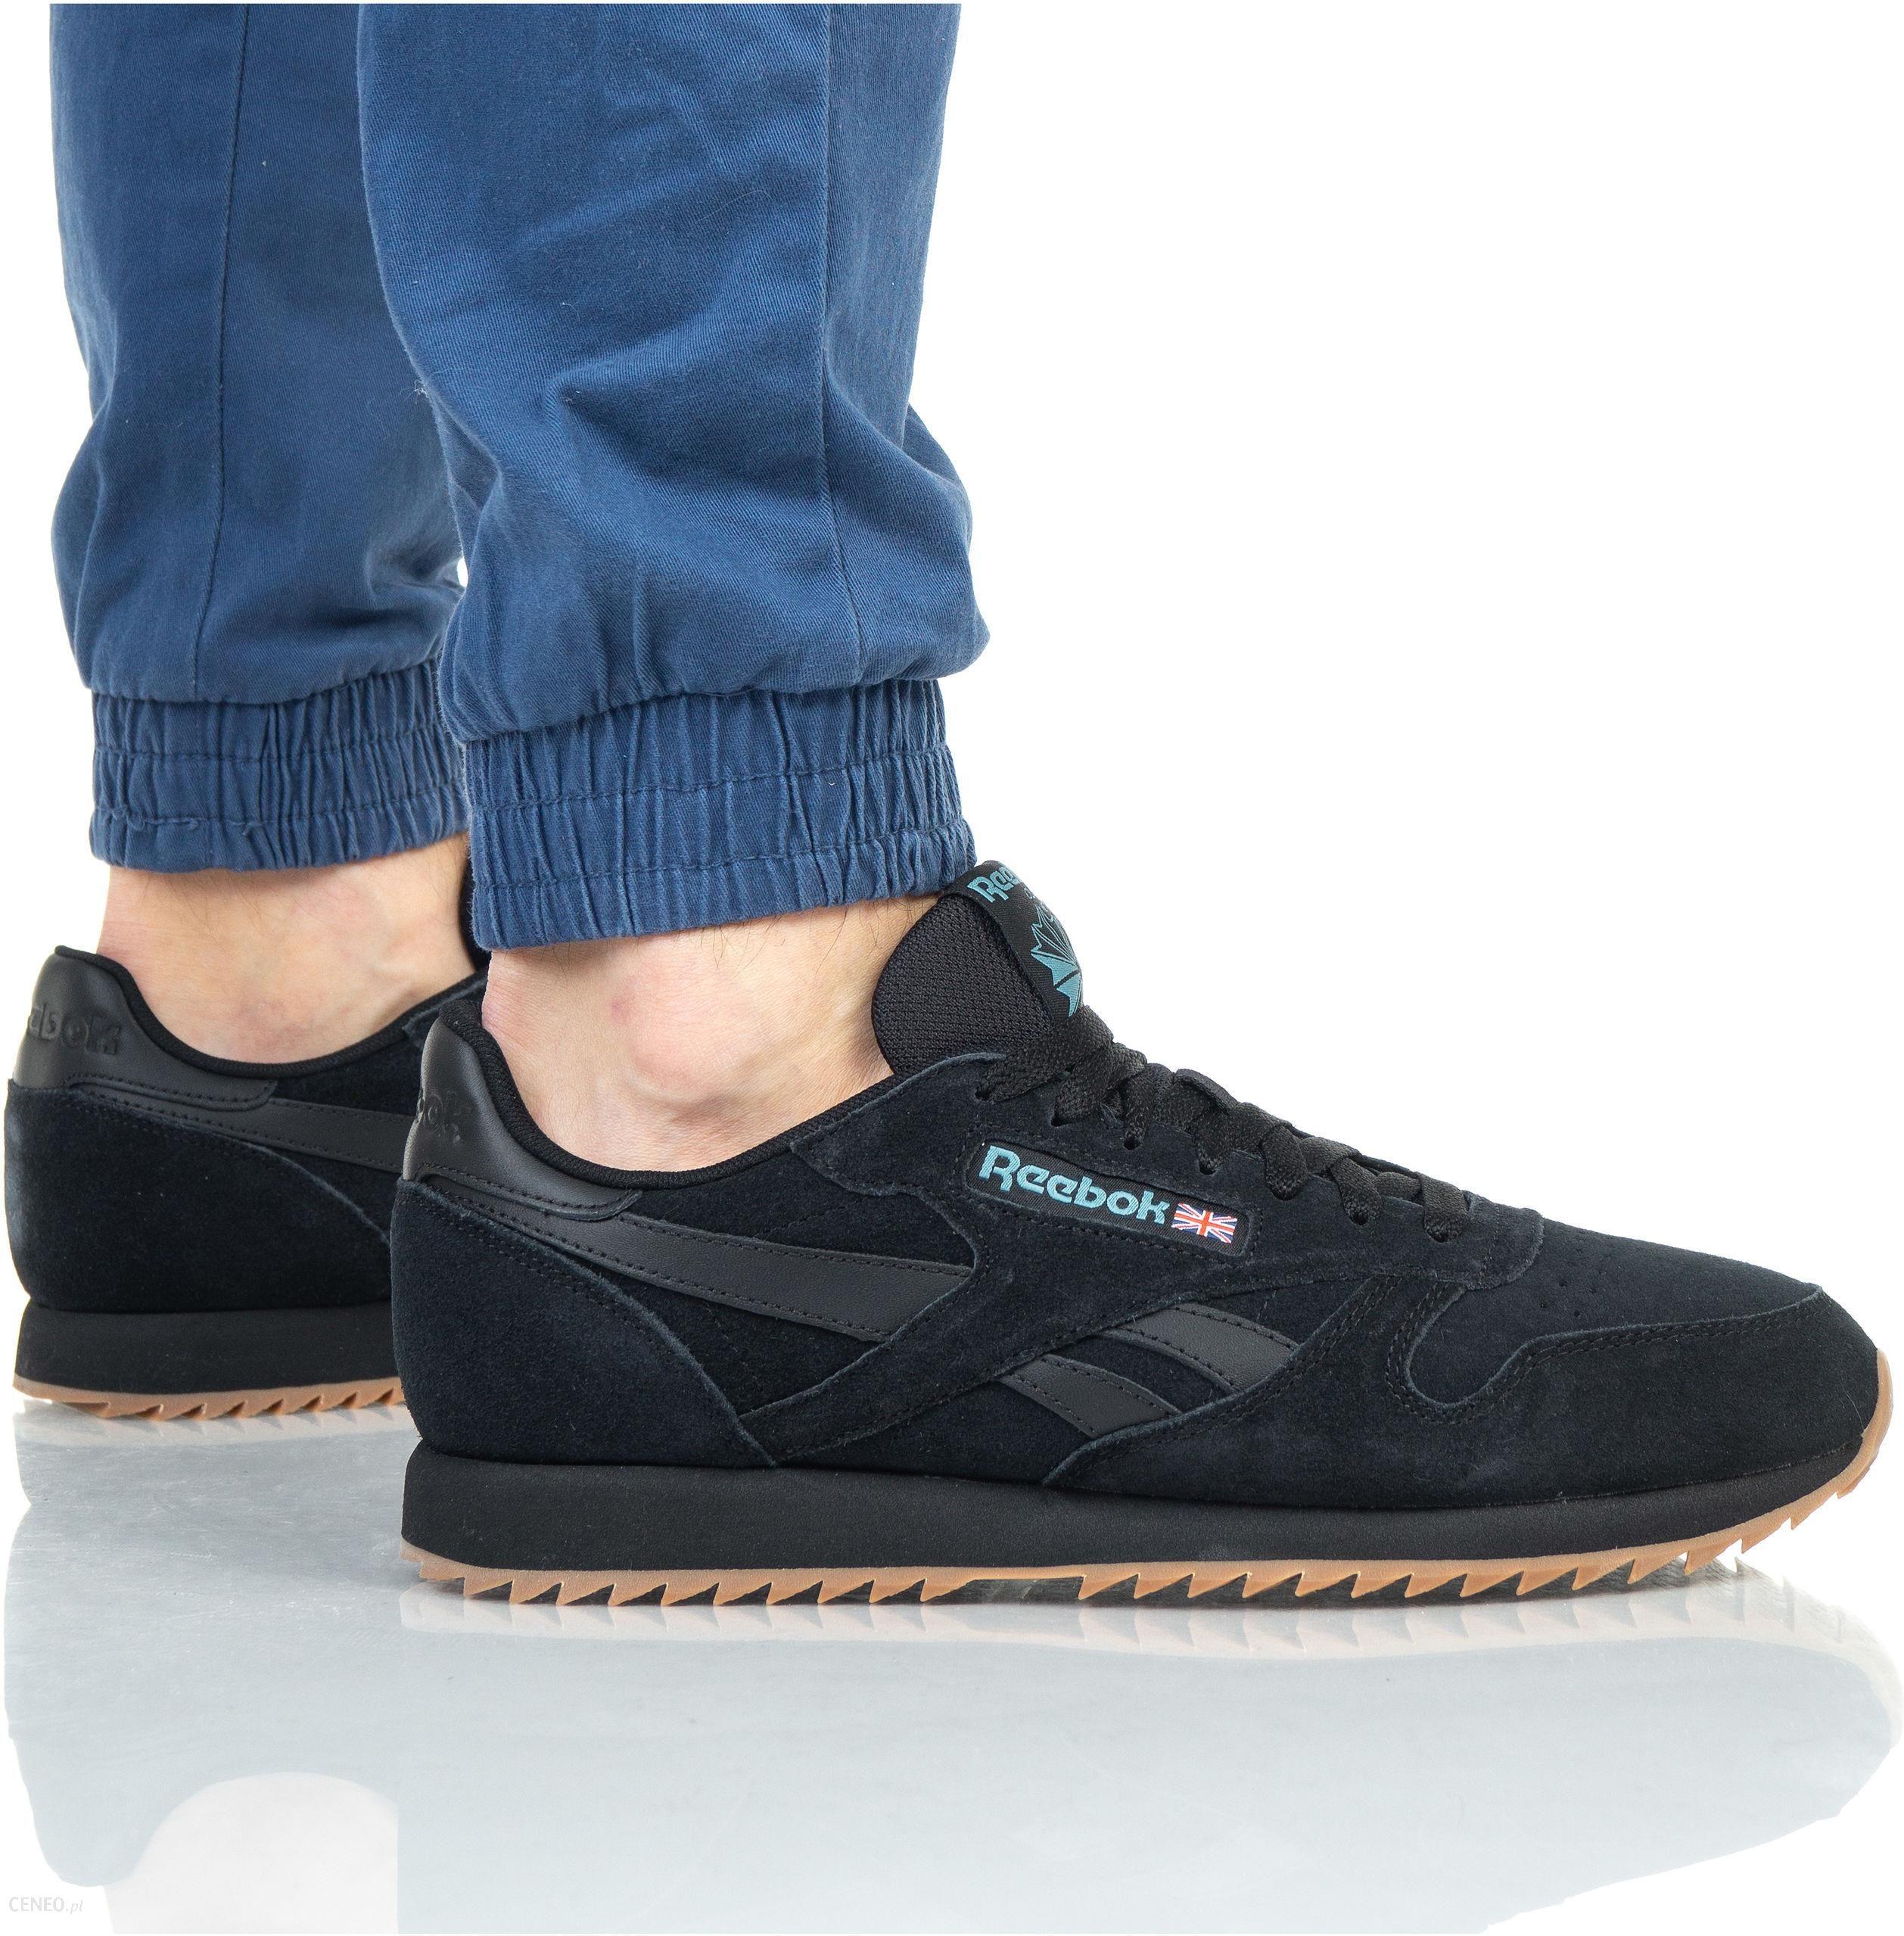 buty sneakers Reebok Classic Leather MU DV3933, męskie, Czarne